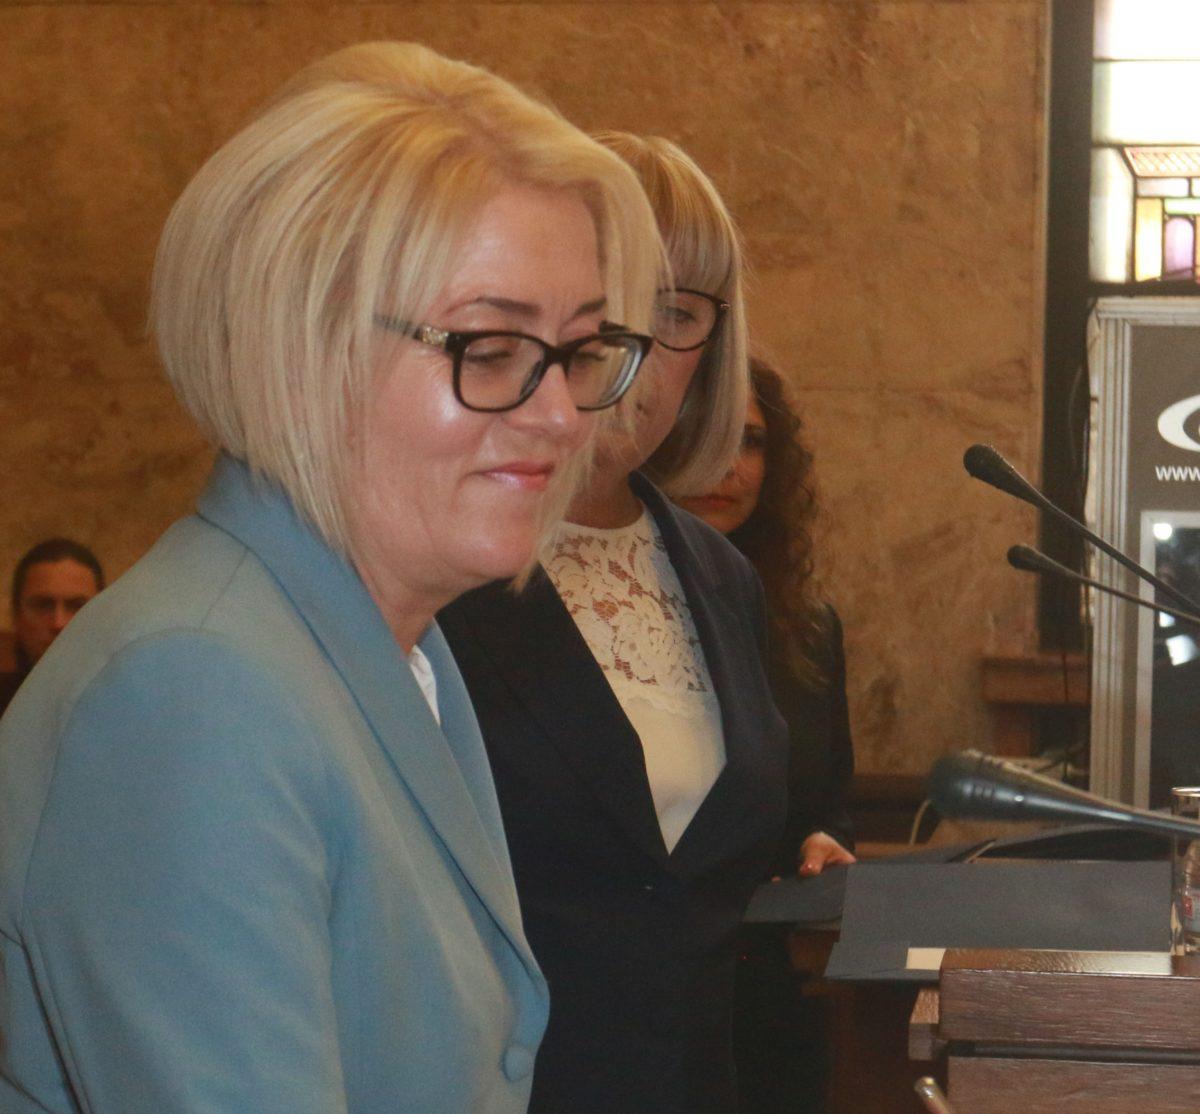 Даниела Машева вече е зам.-главен прокурор